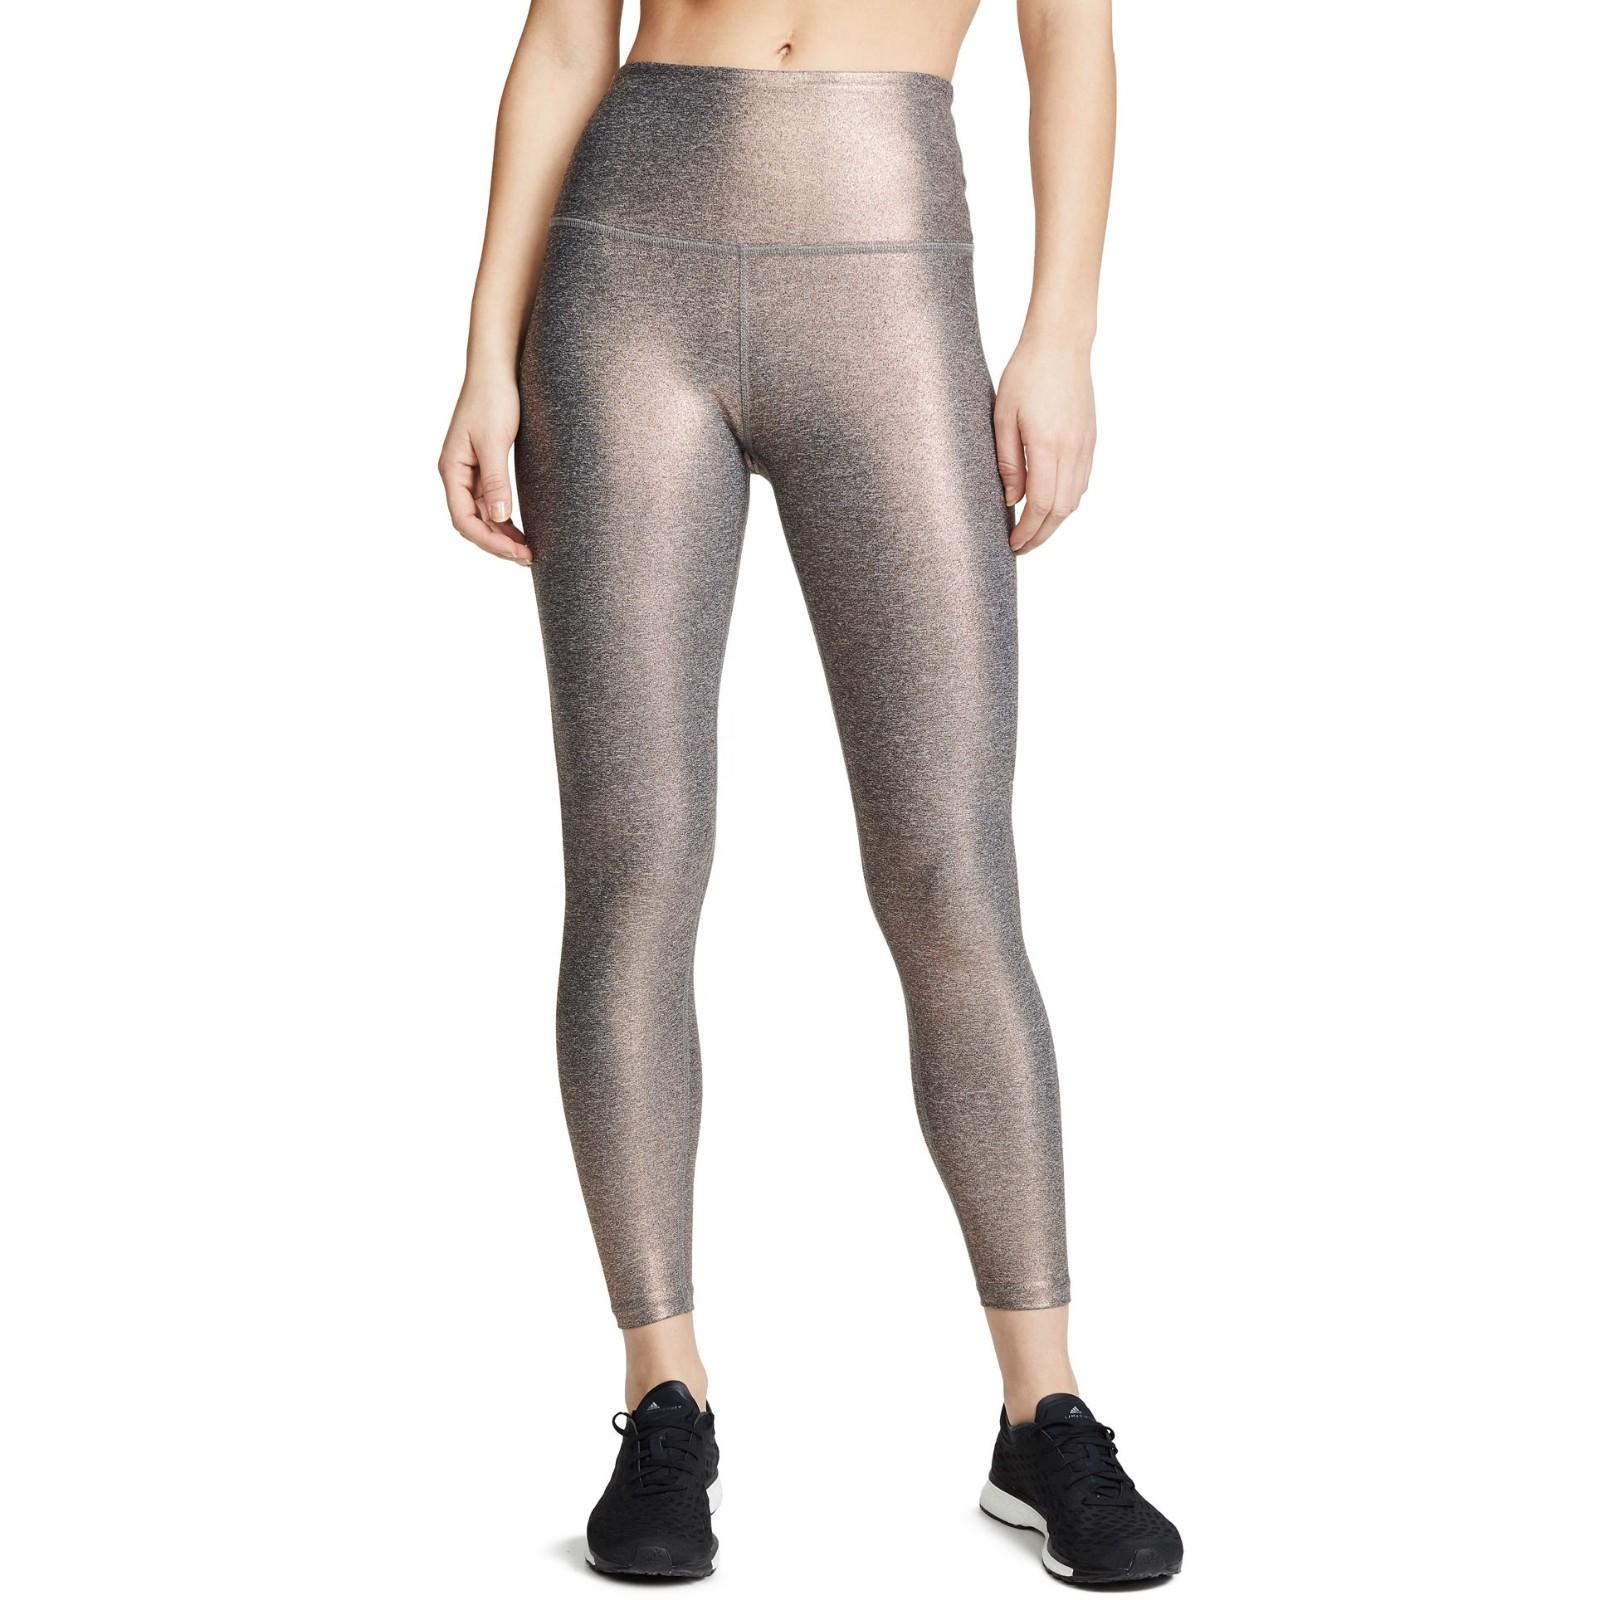 product-Ruiteng-Women New Fashion Style Gym Sportswear Yoga Leggings-img